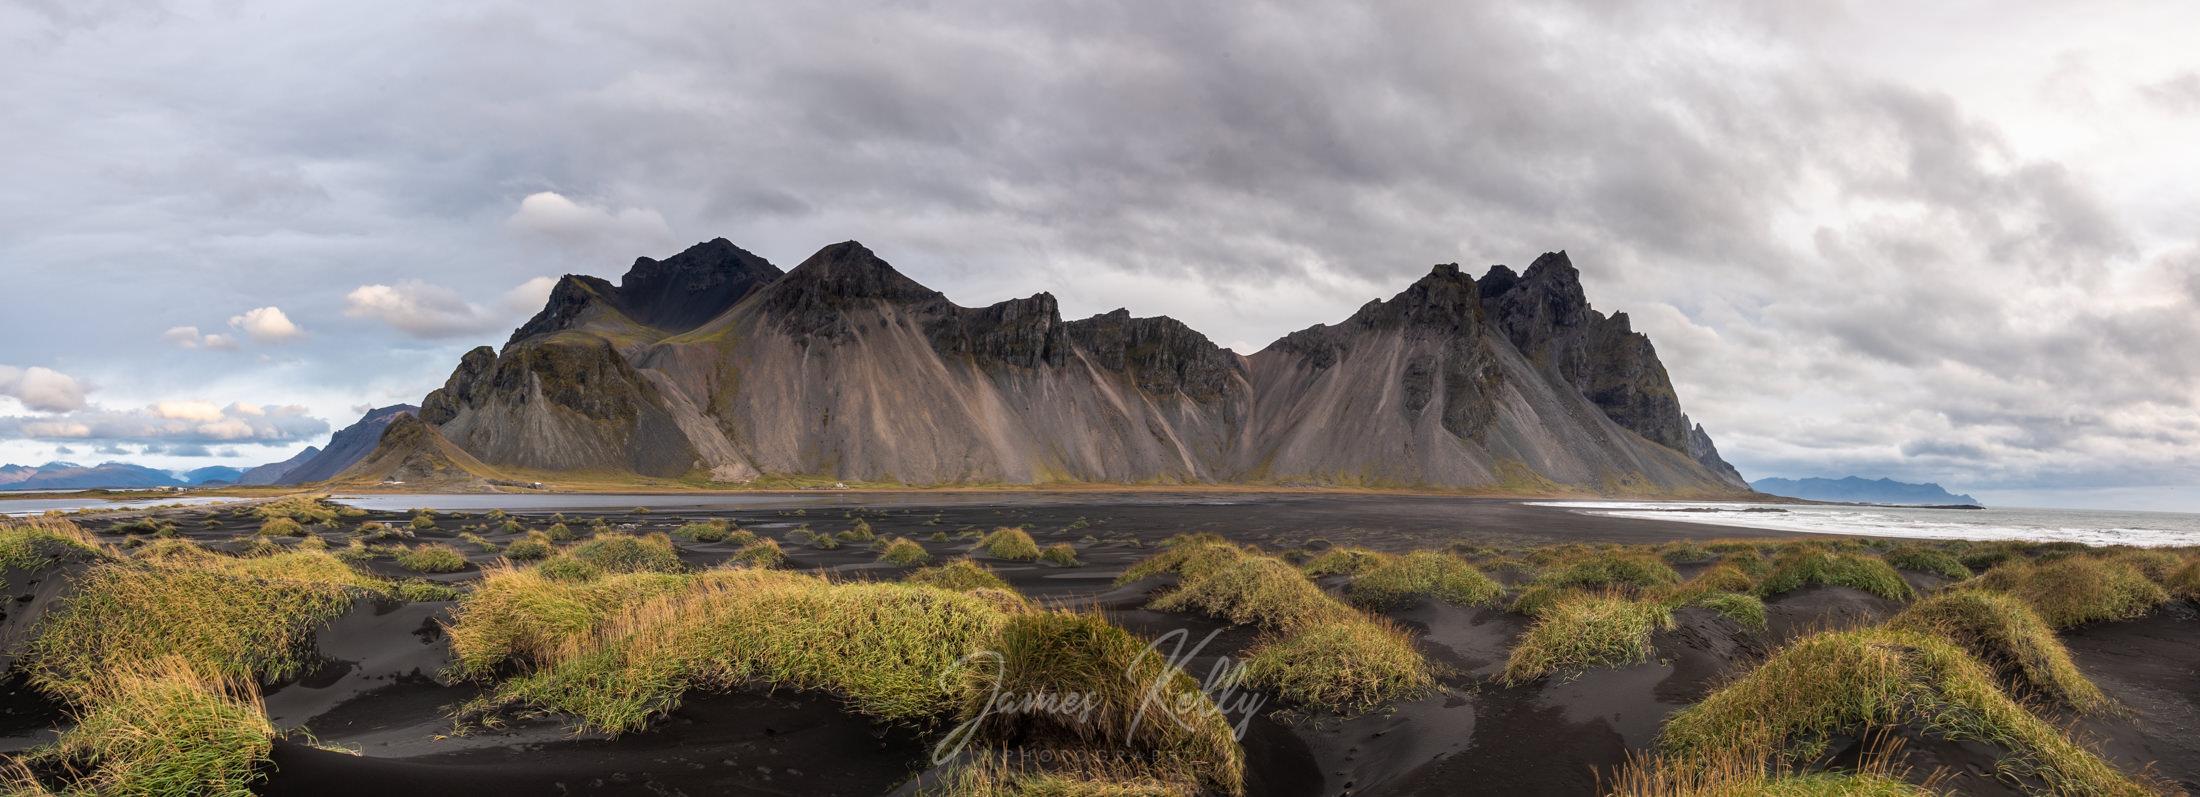 Iceland_180919_013.jpg